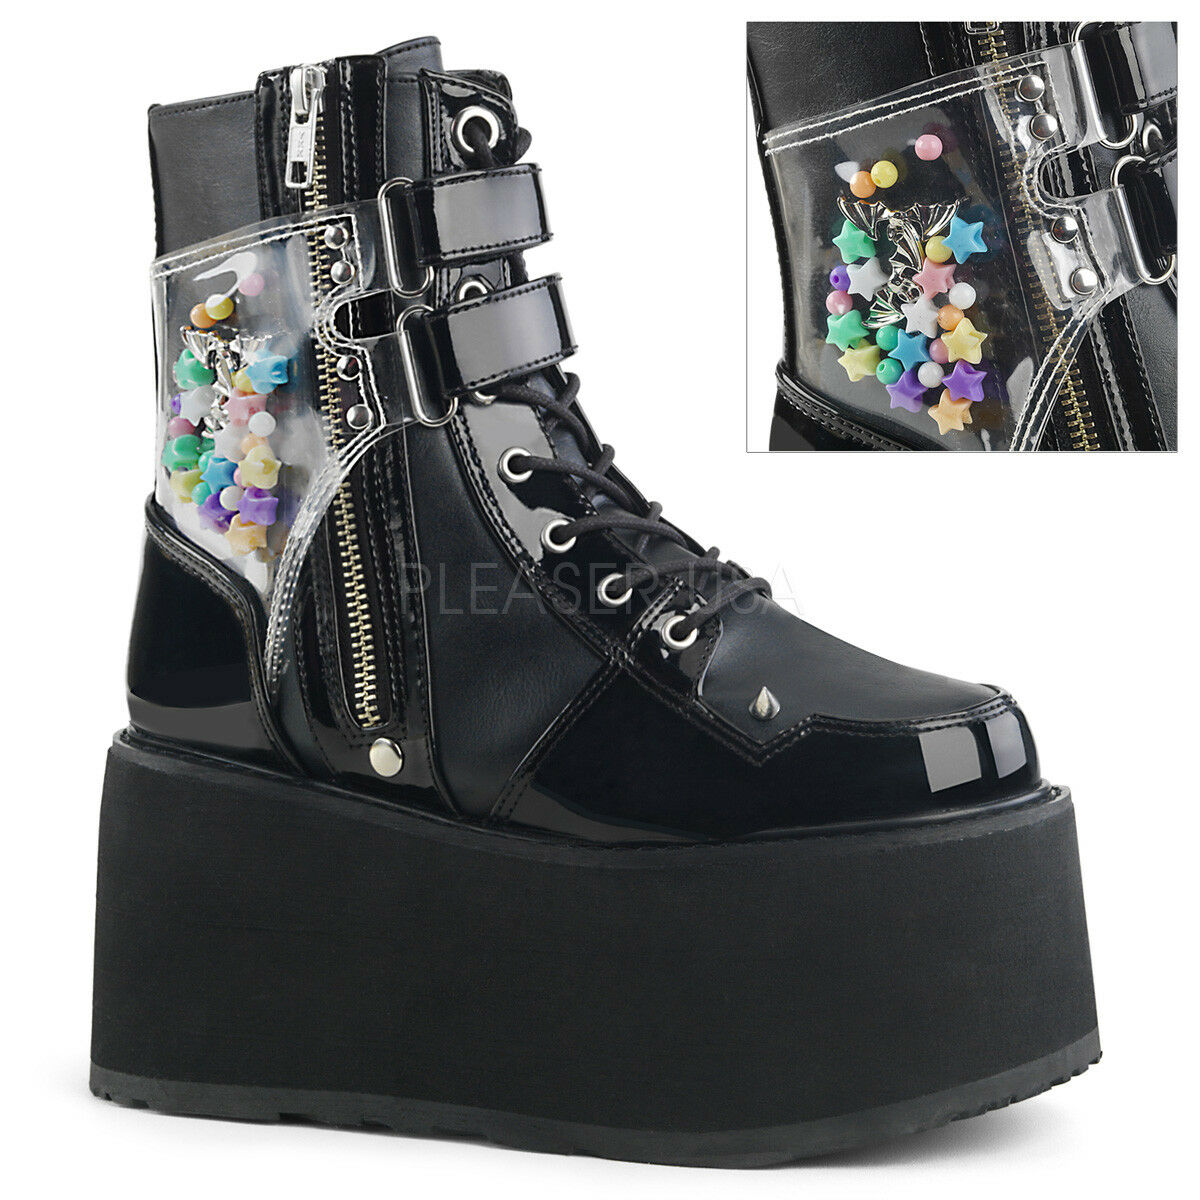 online economico Demonia Damned-115 Punk Rock Gothic Platform nero PA Ankle stivali stivali stivali Spike Details  confortevole